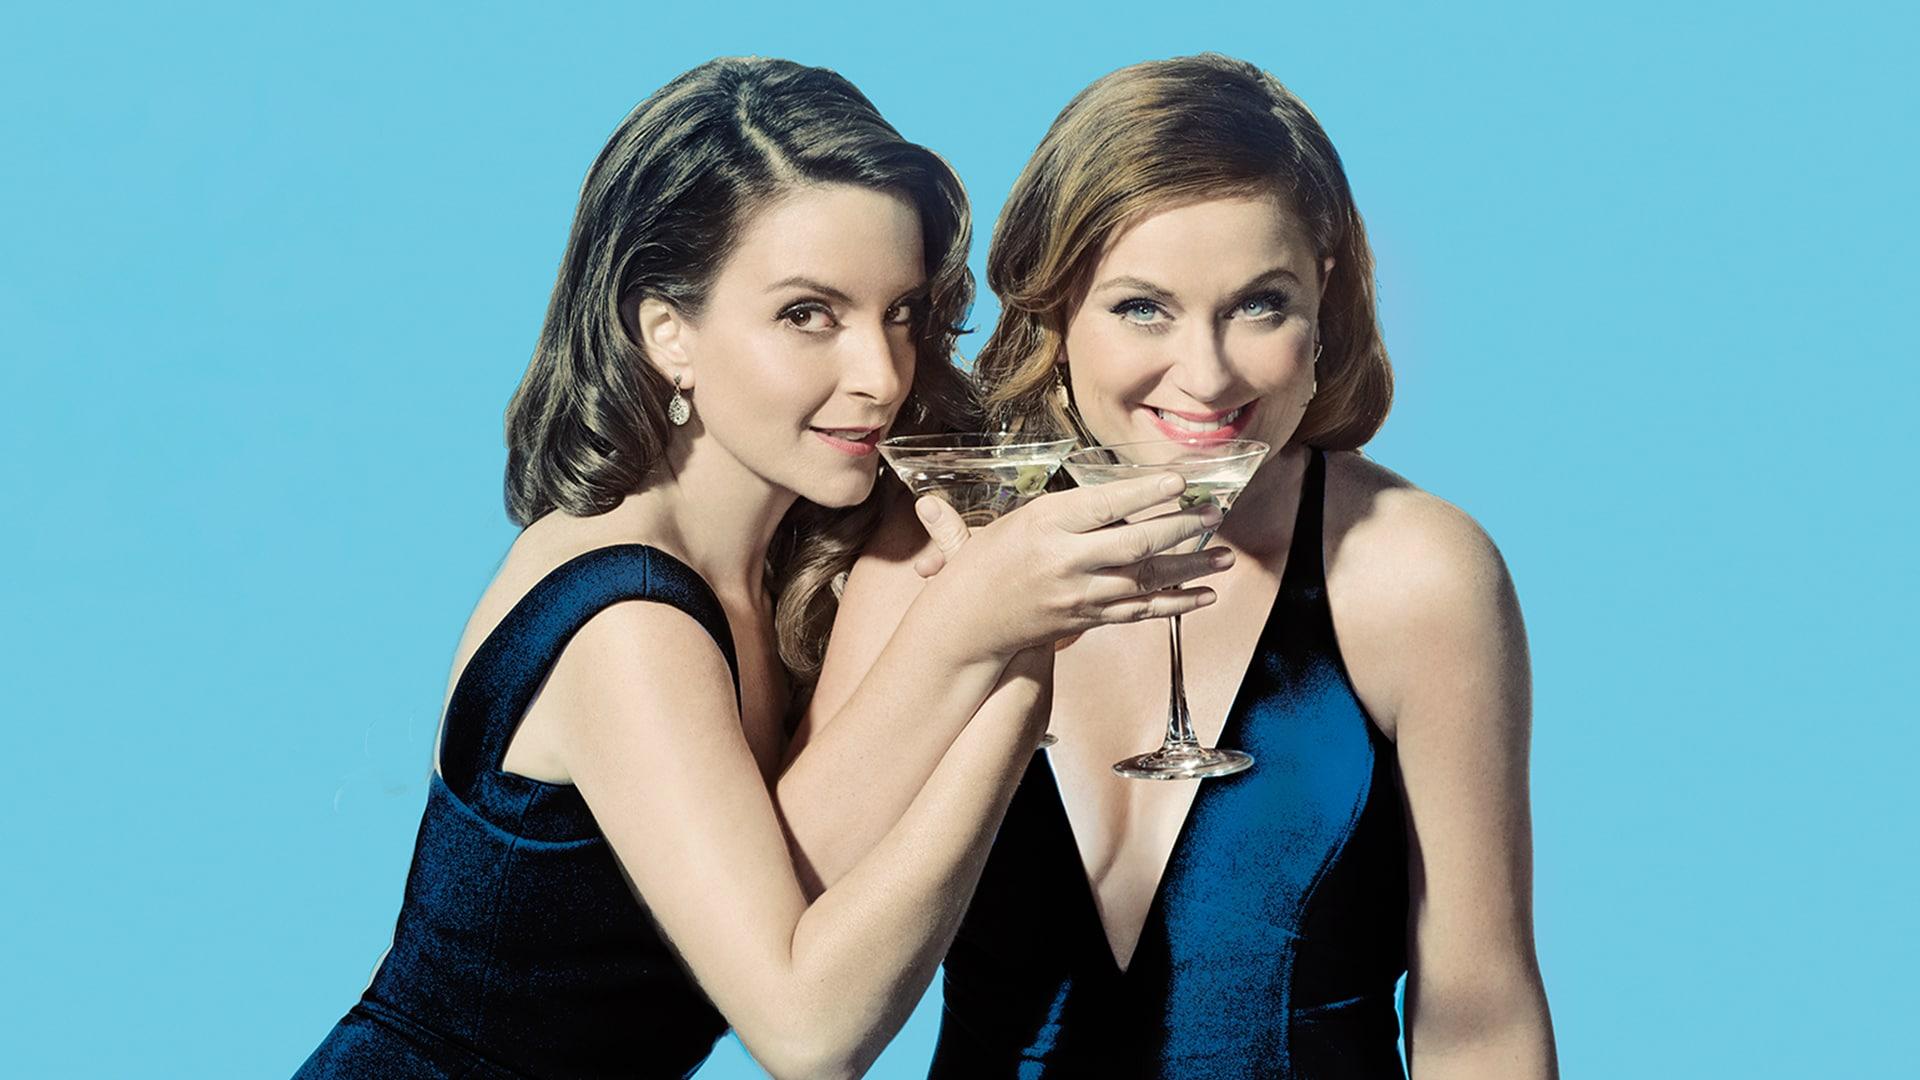 Tina Fey and Amy Poehler: December 19, 2015